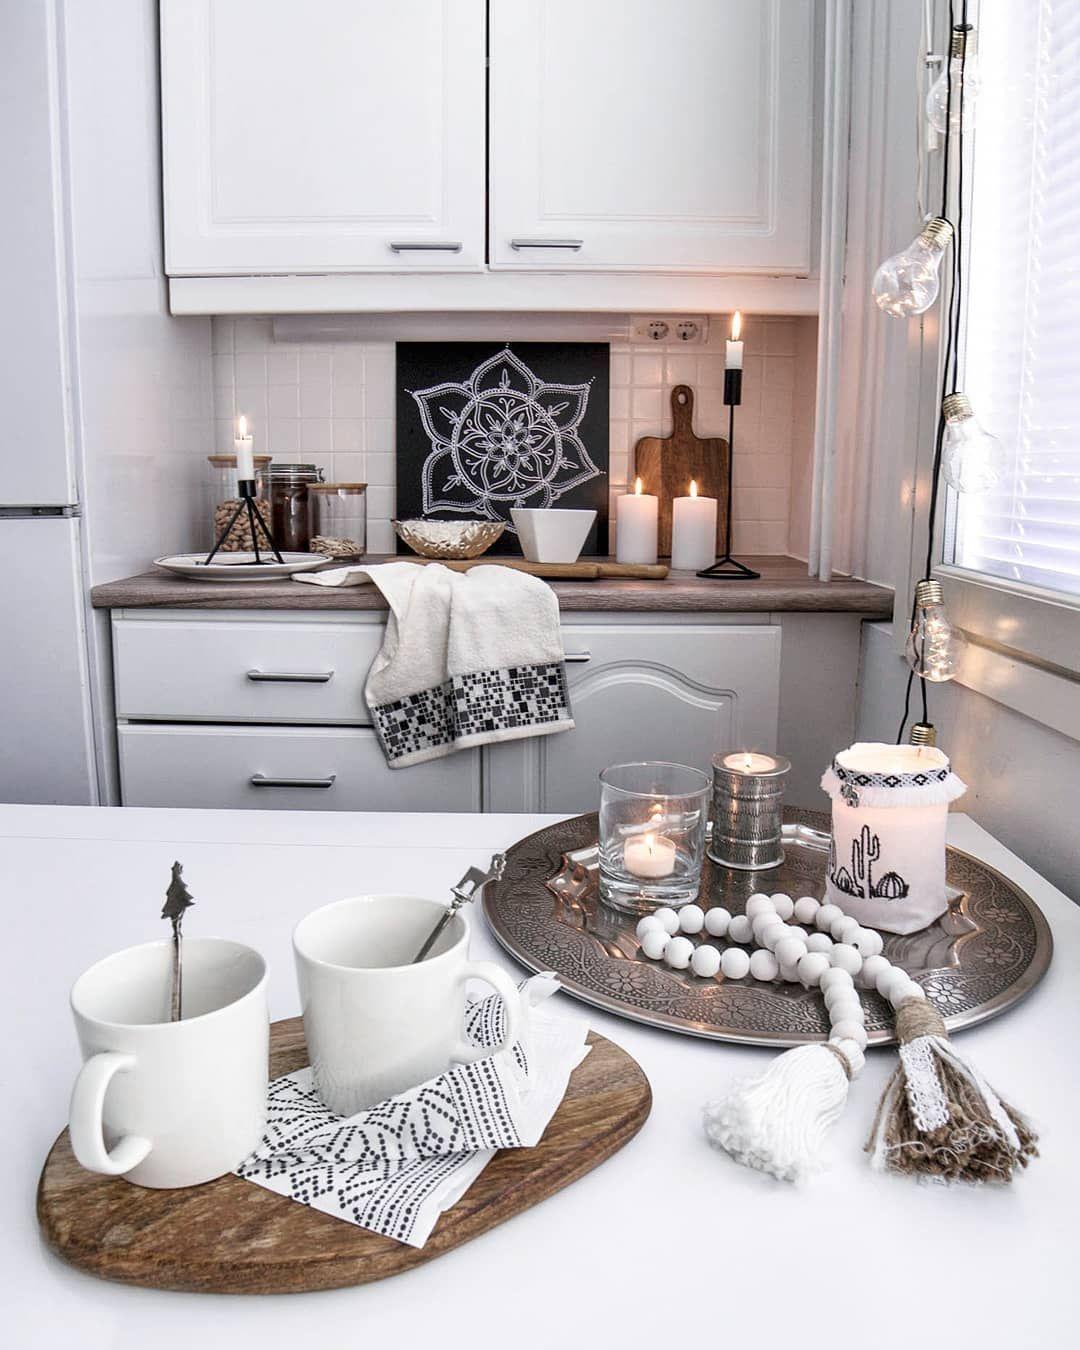 scandinavian bohemian chic kitchen decor with images chic kitchen decor kitchen decor kitchen on boho chic kitchen table decor id=63714